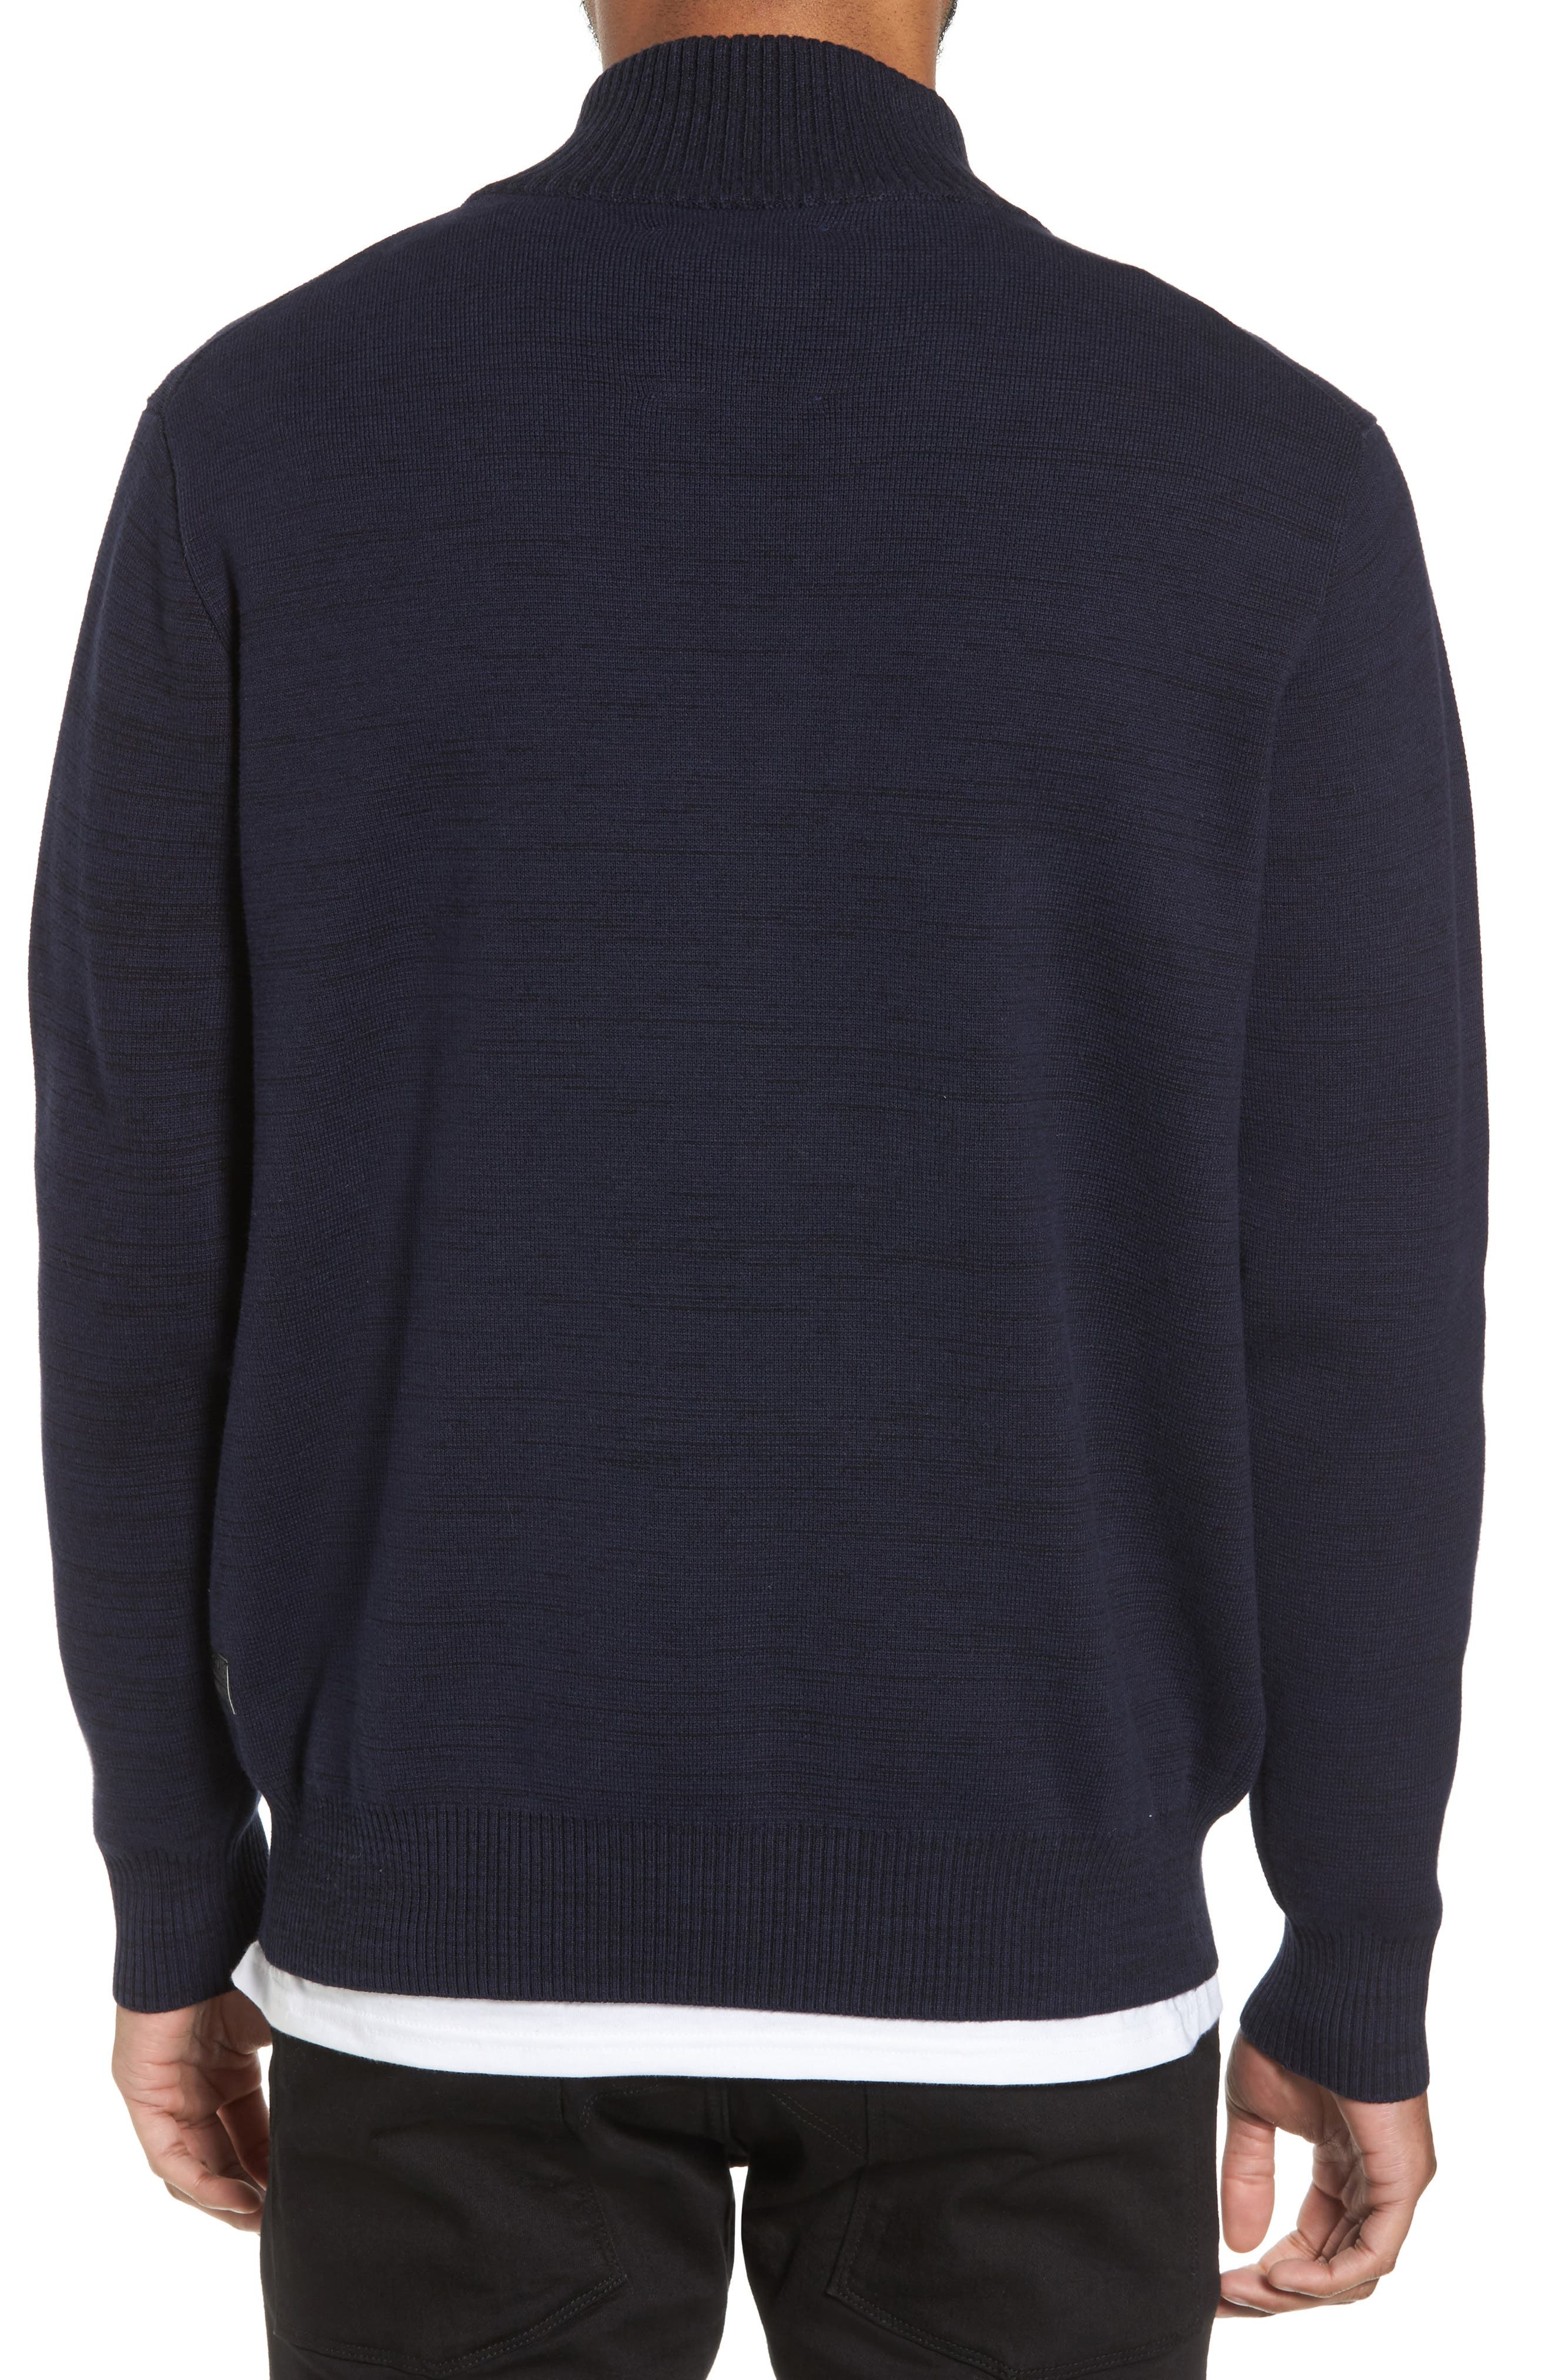 Empral Half-Zip Sweater,                             Alternate thumbnail 2, color,                             Blue/ Dark Black